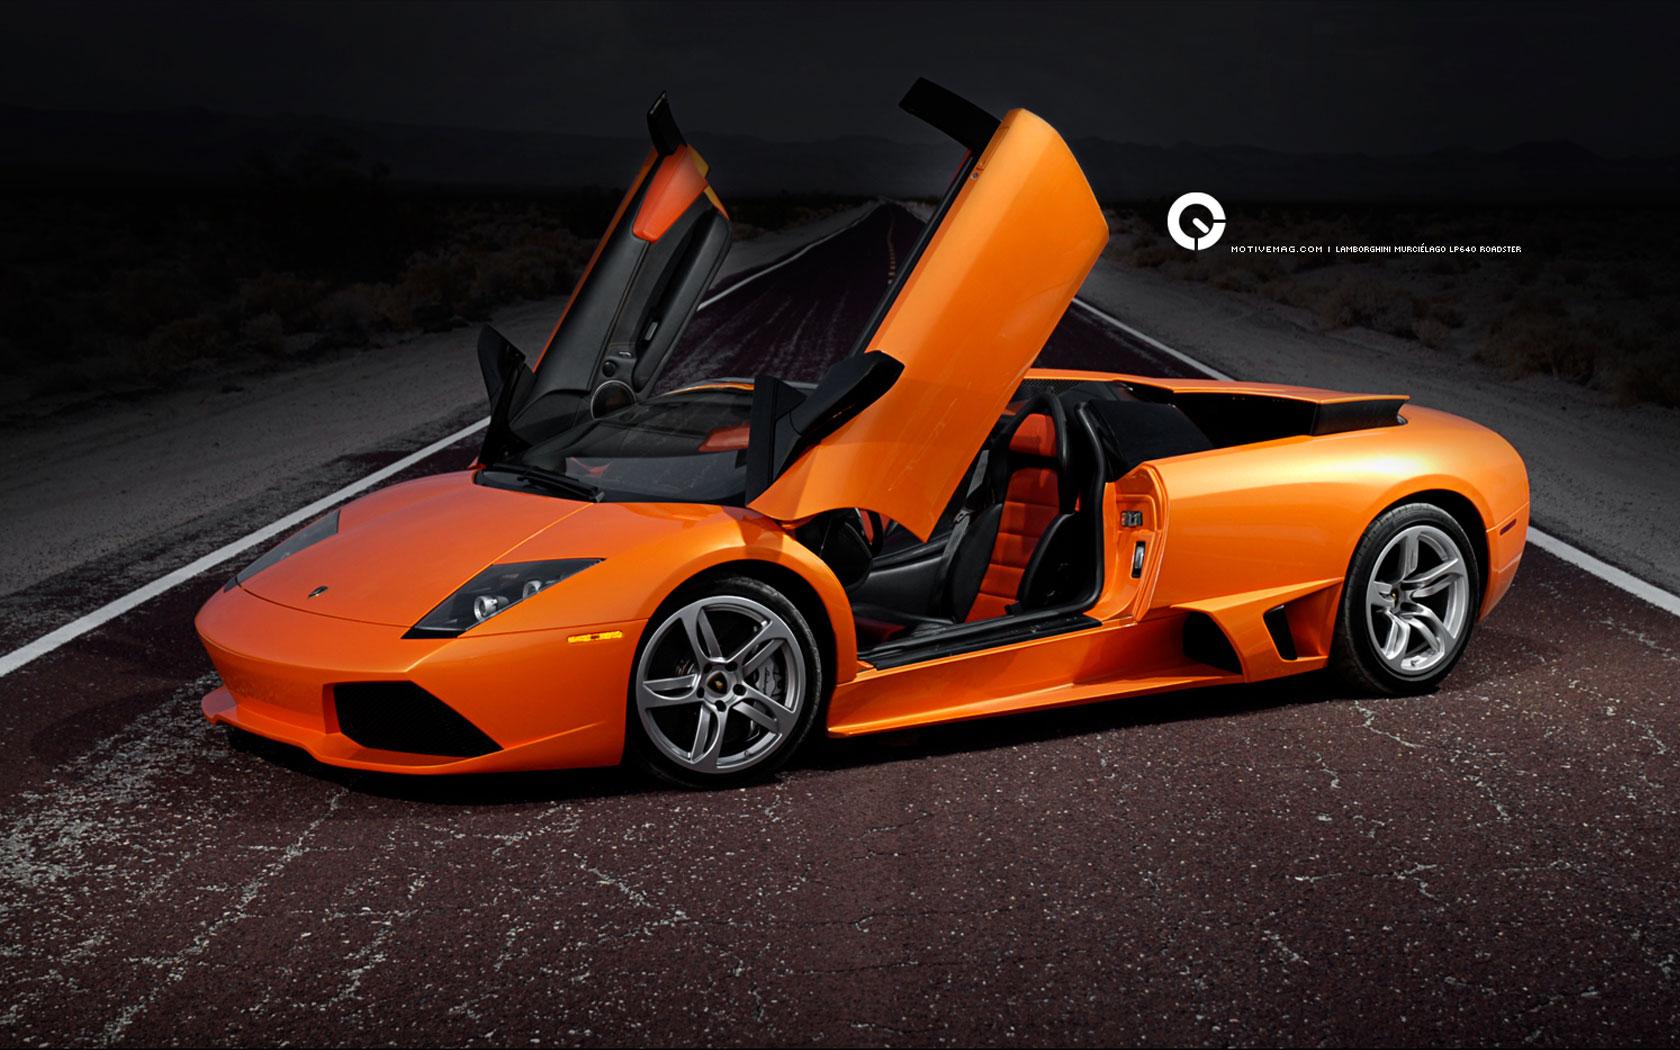 Lamborghini Cars Wallpapers Free Download HD Latest Motors Images 1680x1050